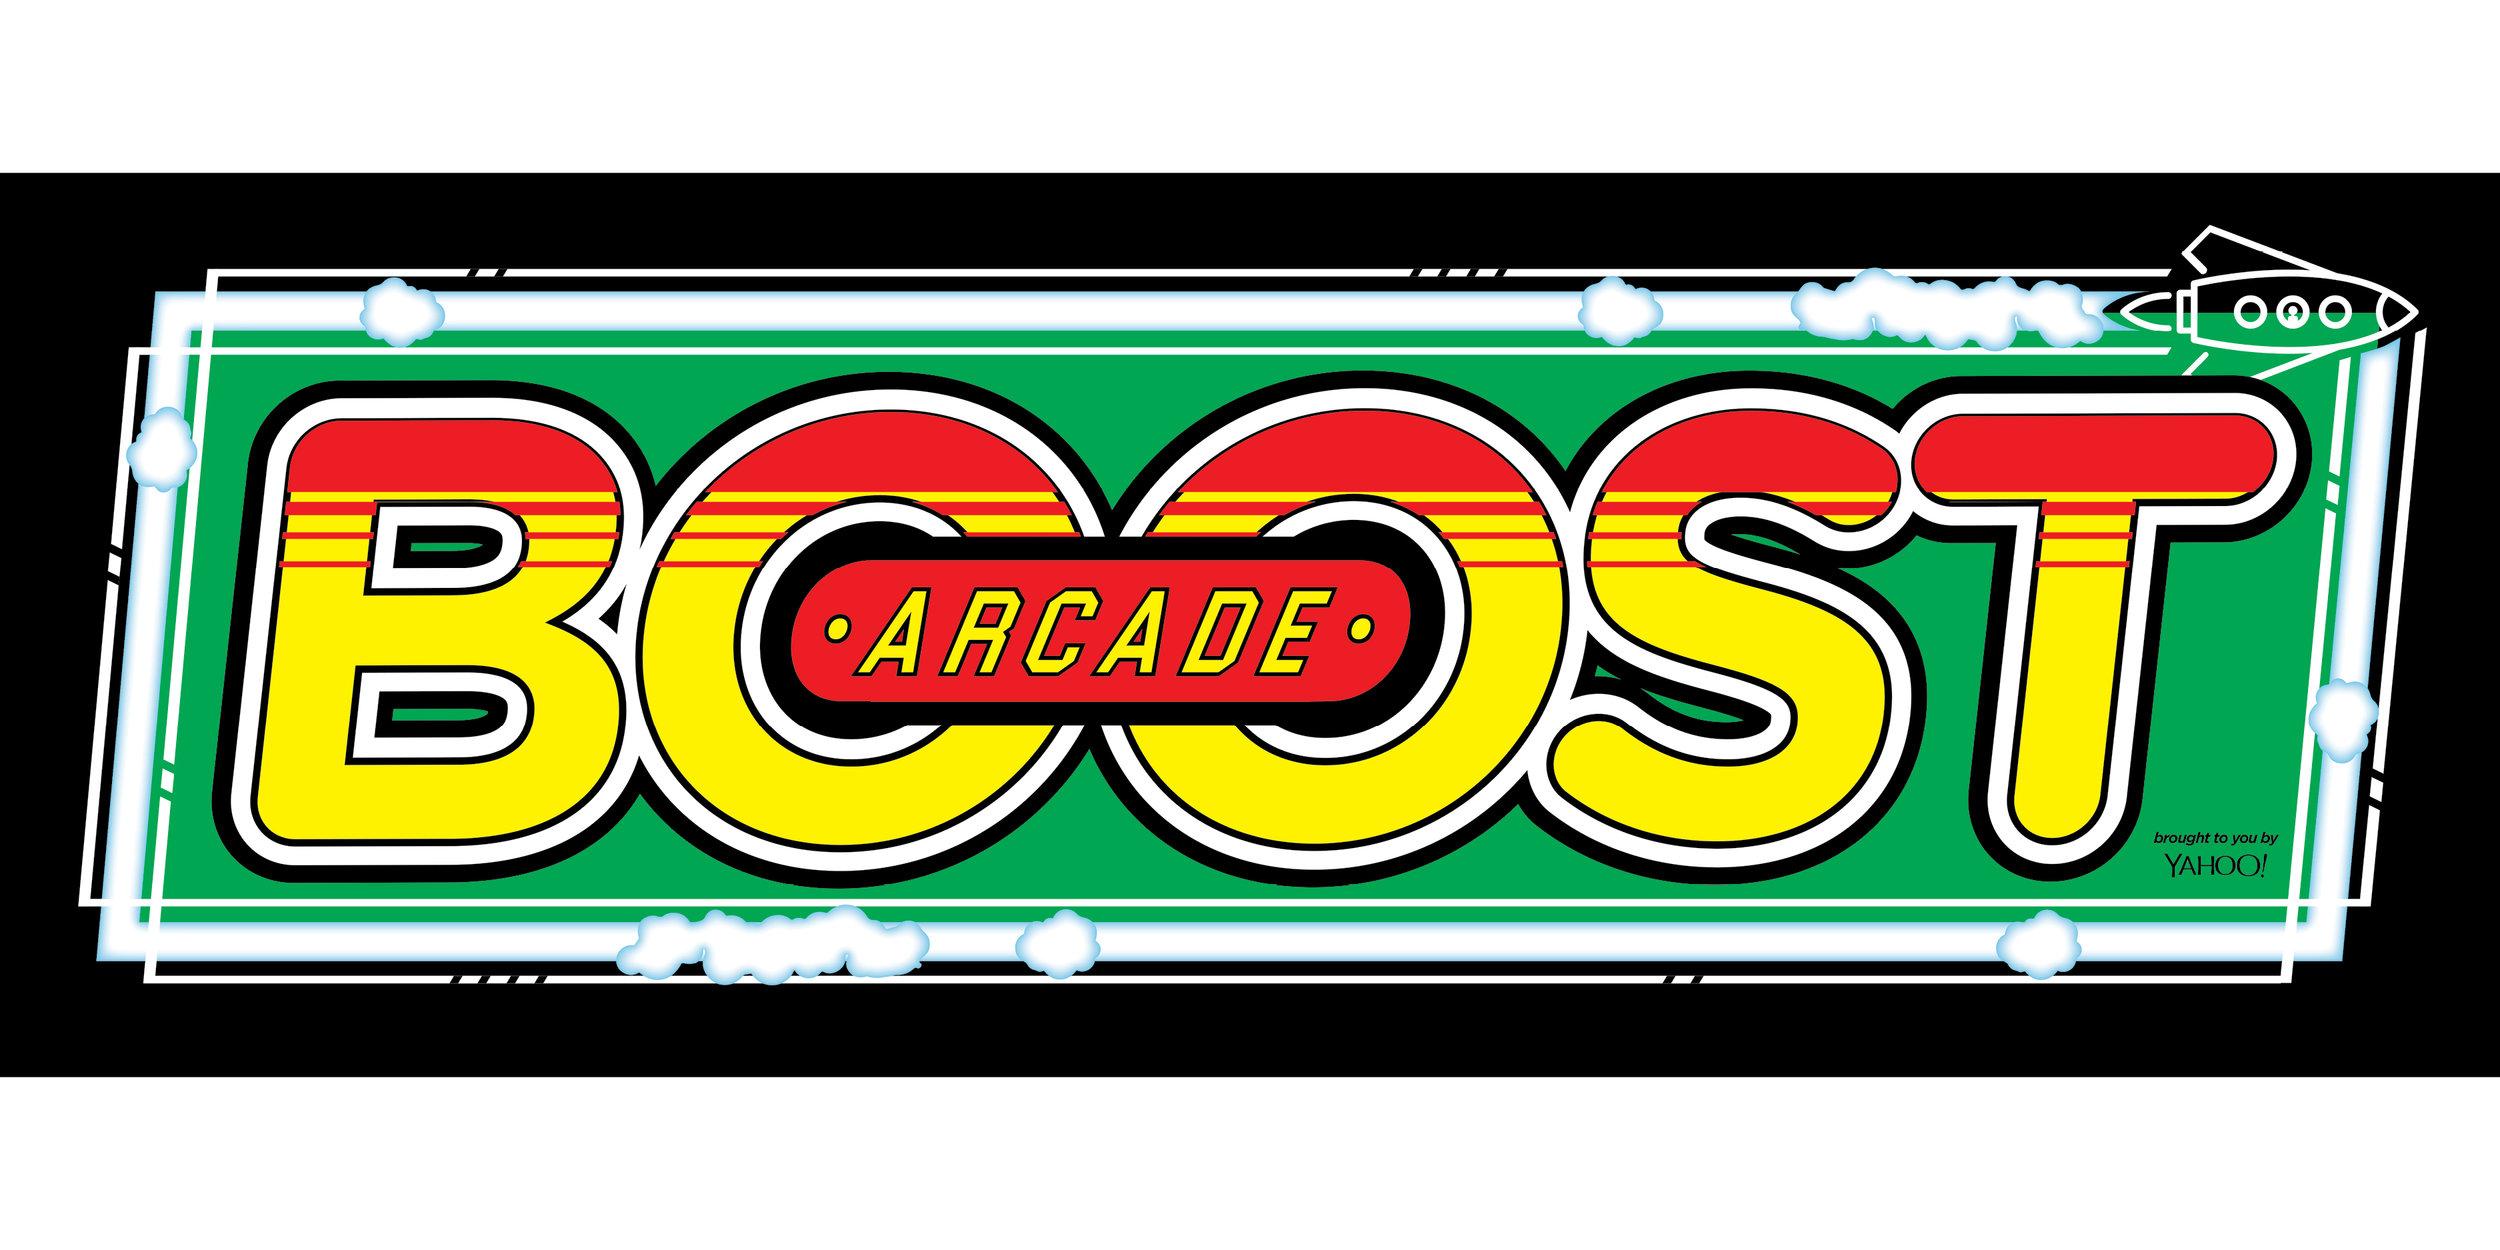 Arcade Comps23.jpg